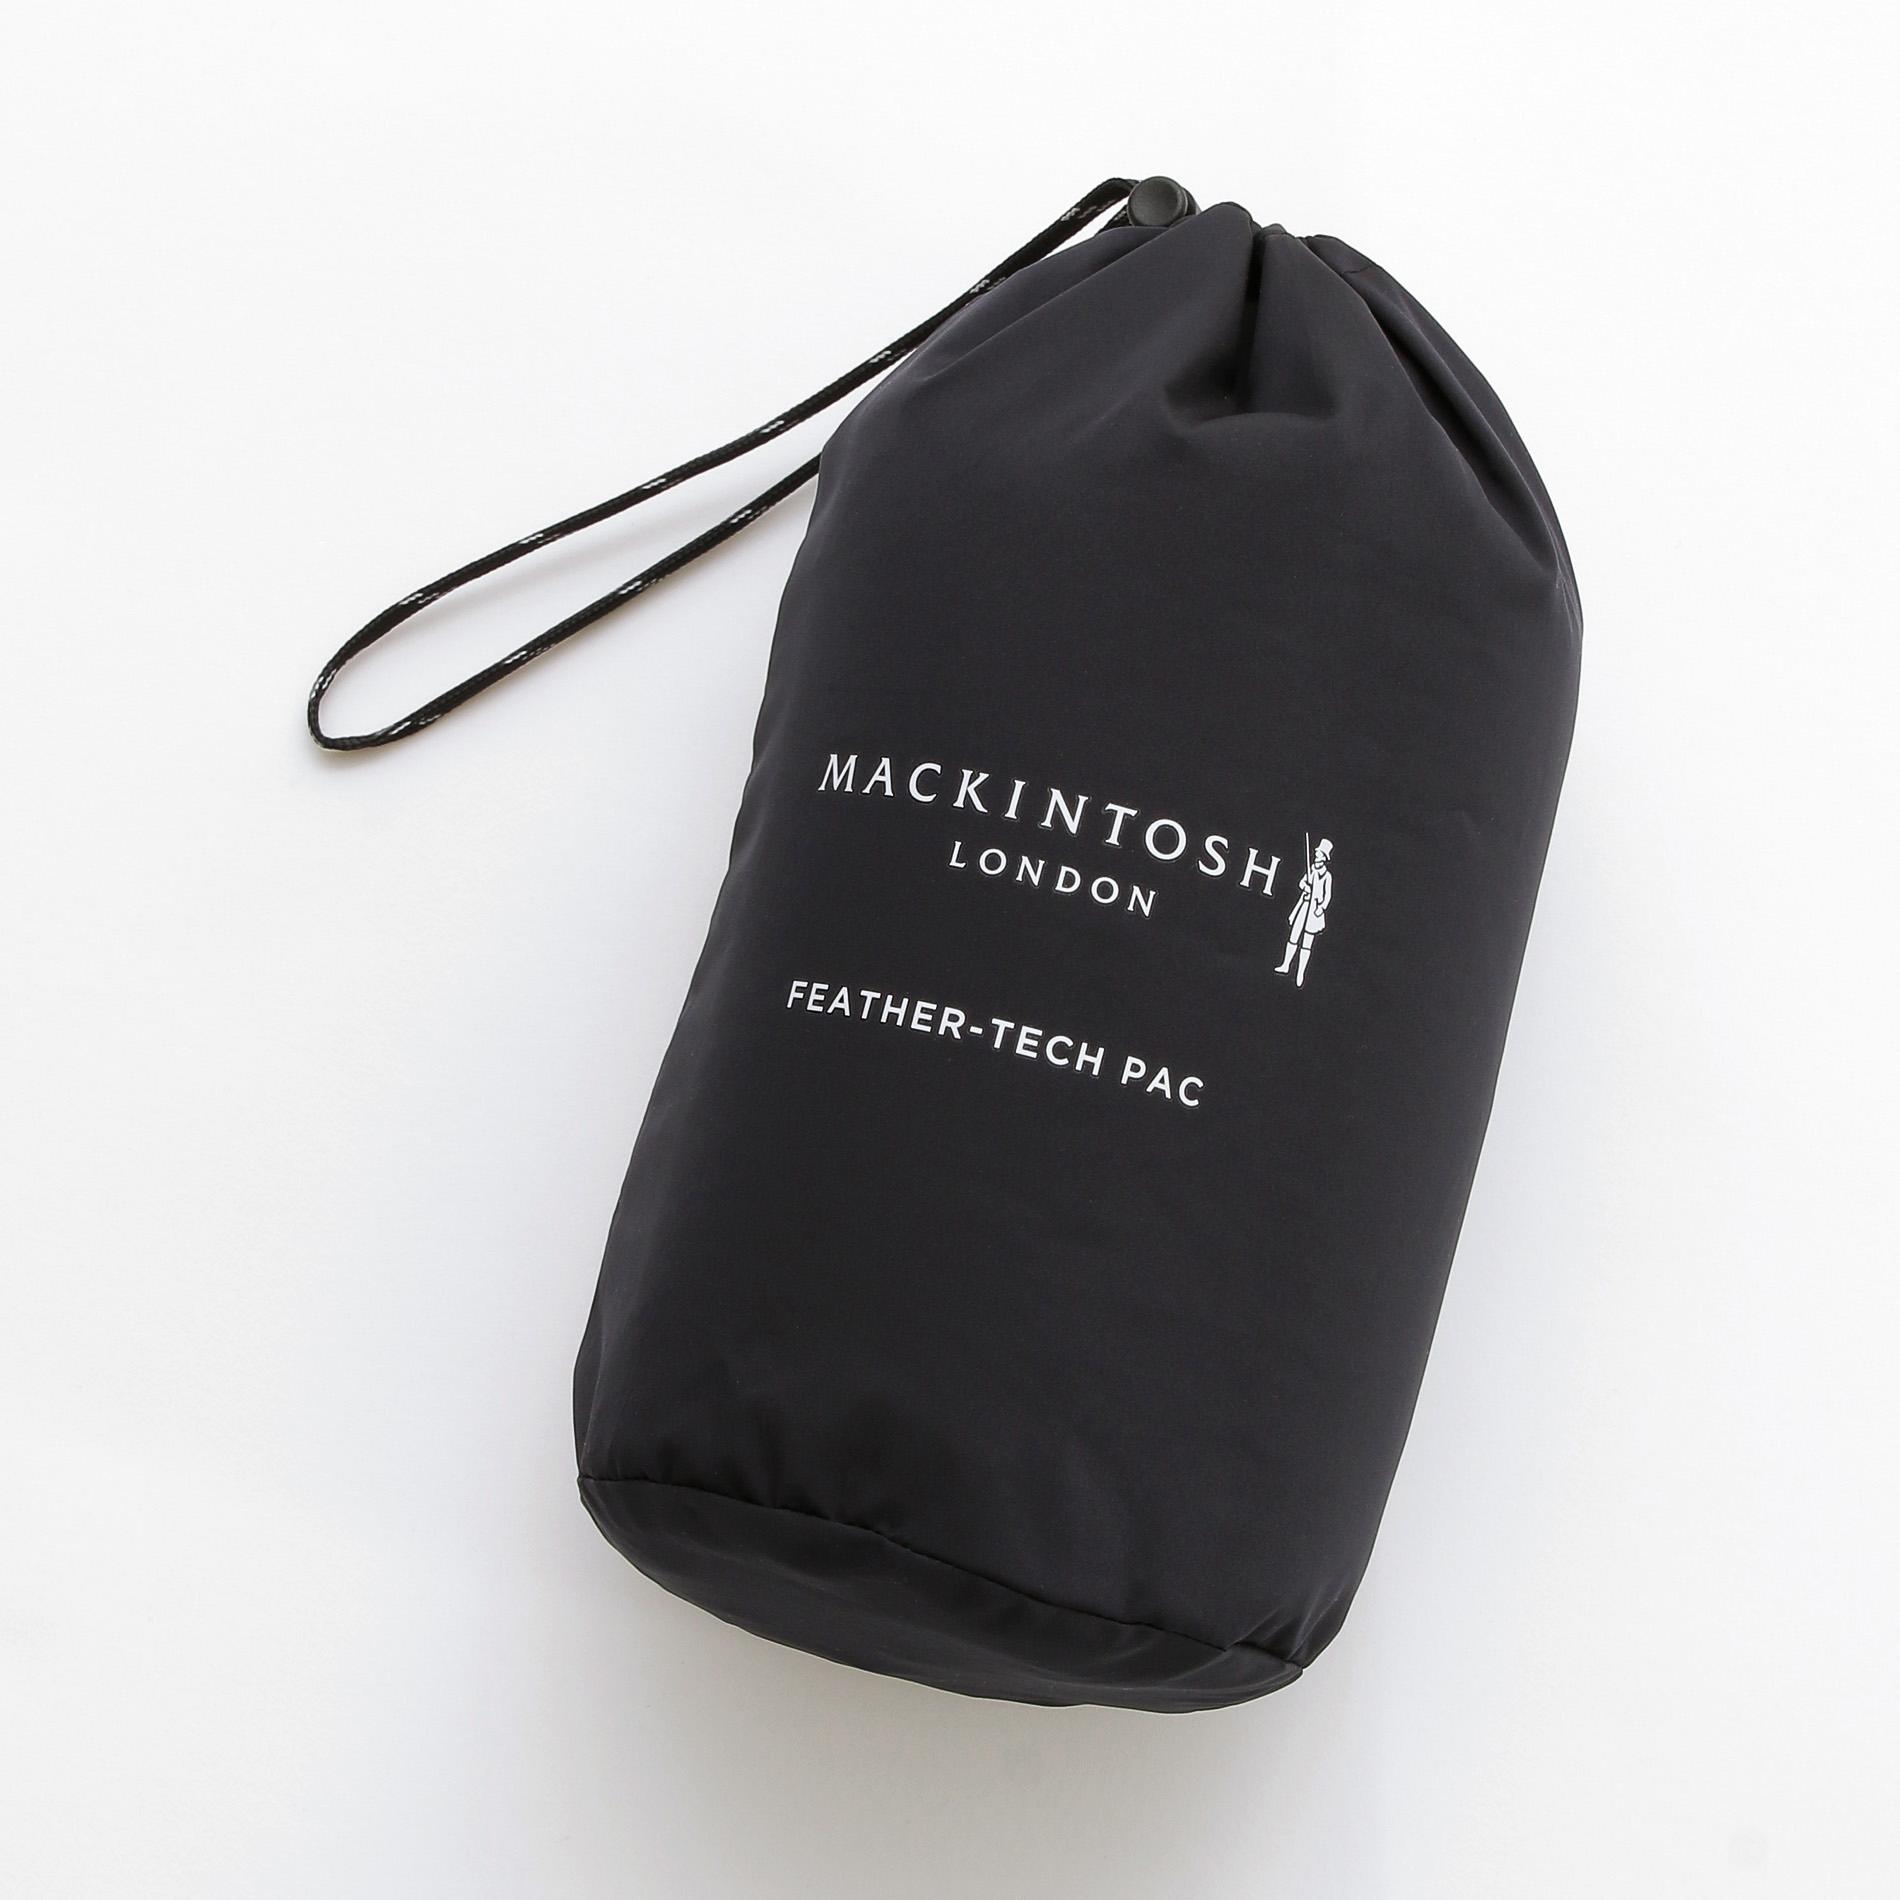 【FEATHER-TECH PAC】ストレッチシンセティックブルゾン